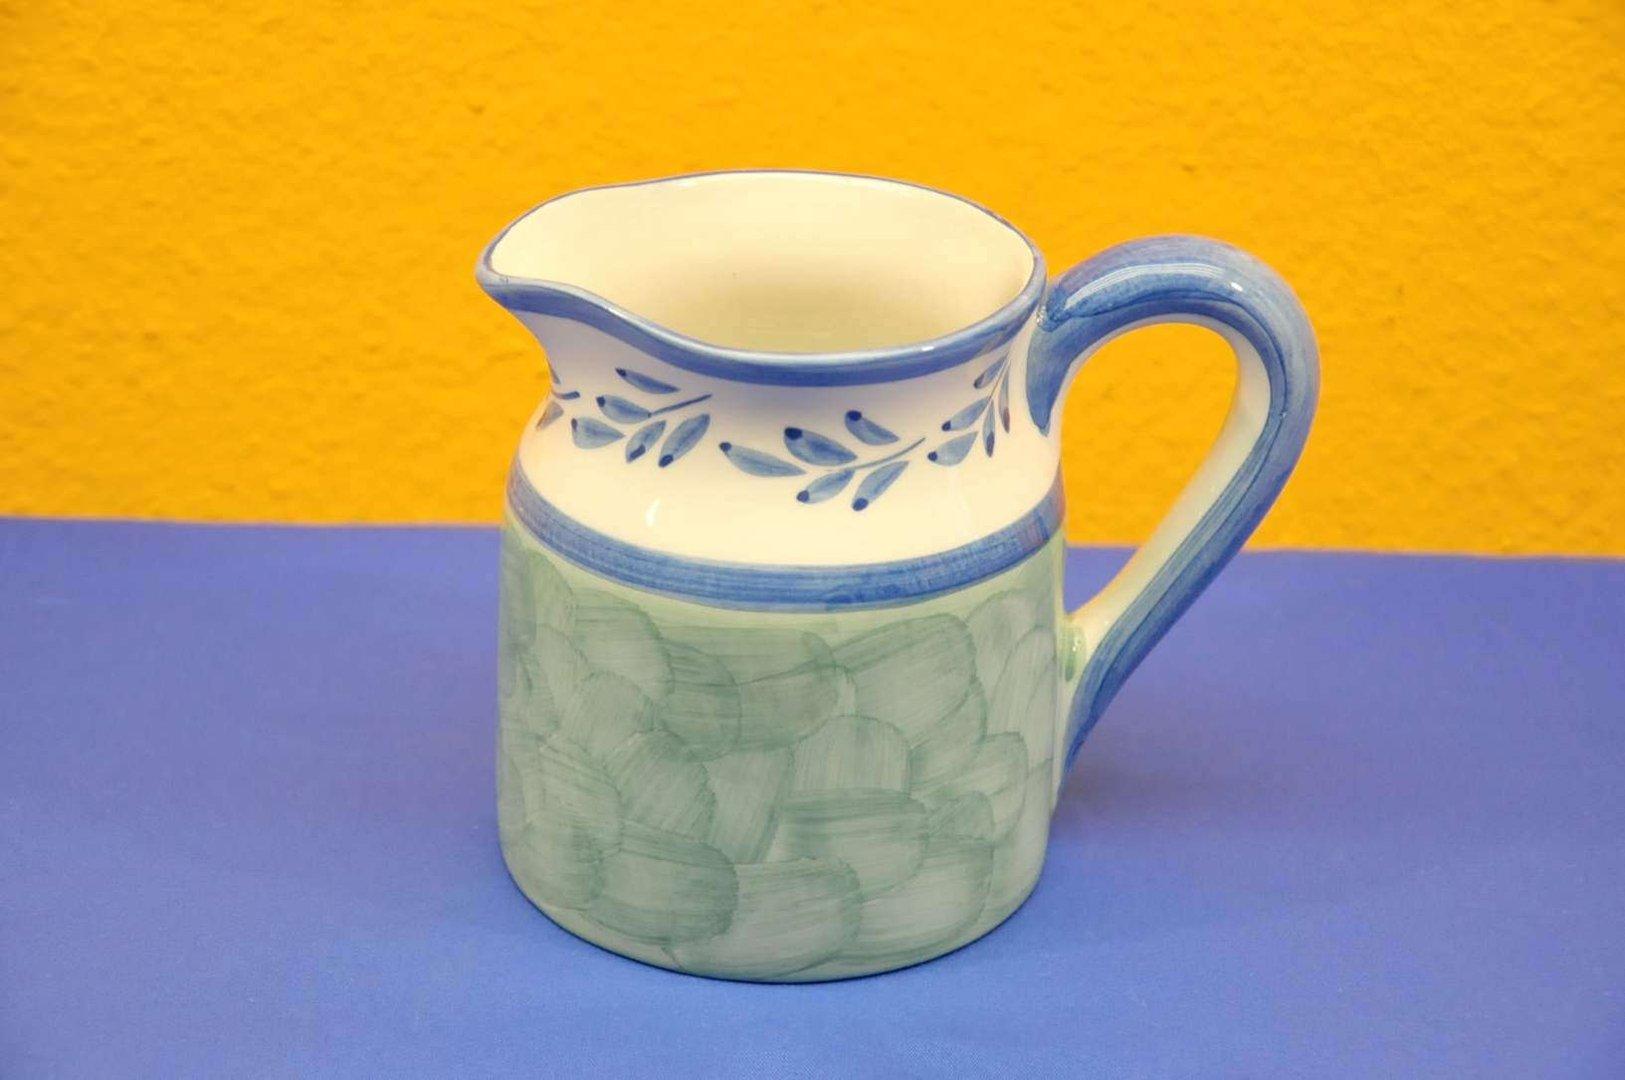 villeroy boch gallo switch 3 milk jug buy at shop kusera. Black Bedroom Furniture Sets. Home Design Ideas